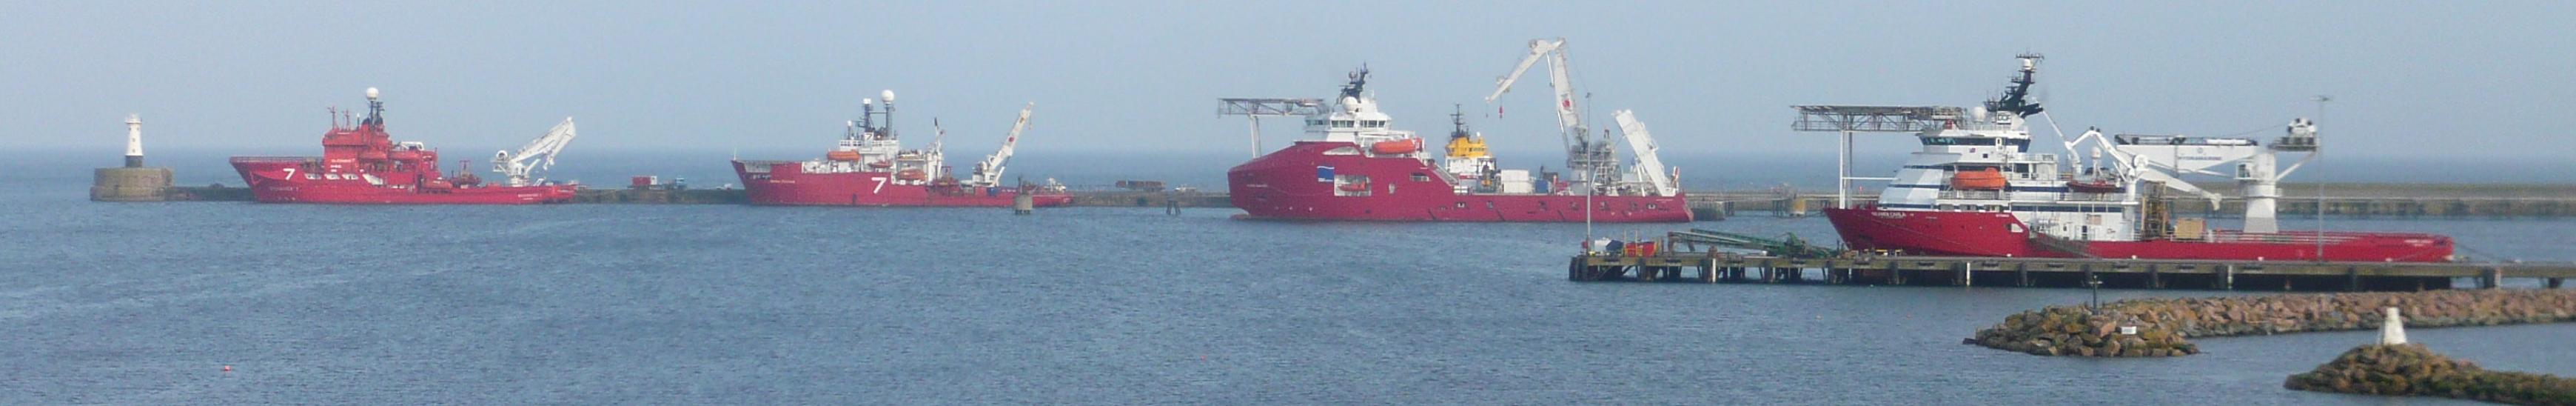 Marine Supply